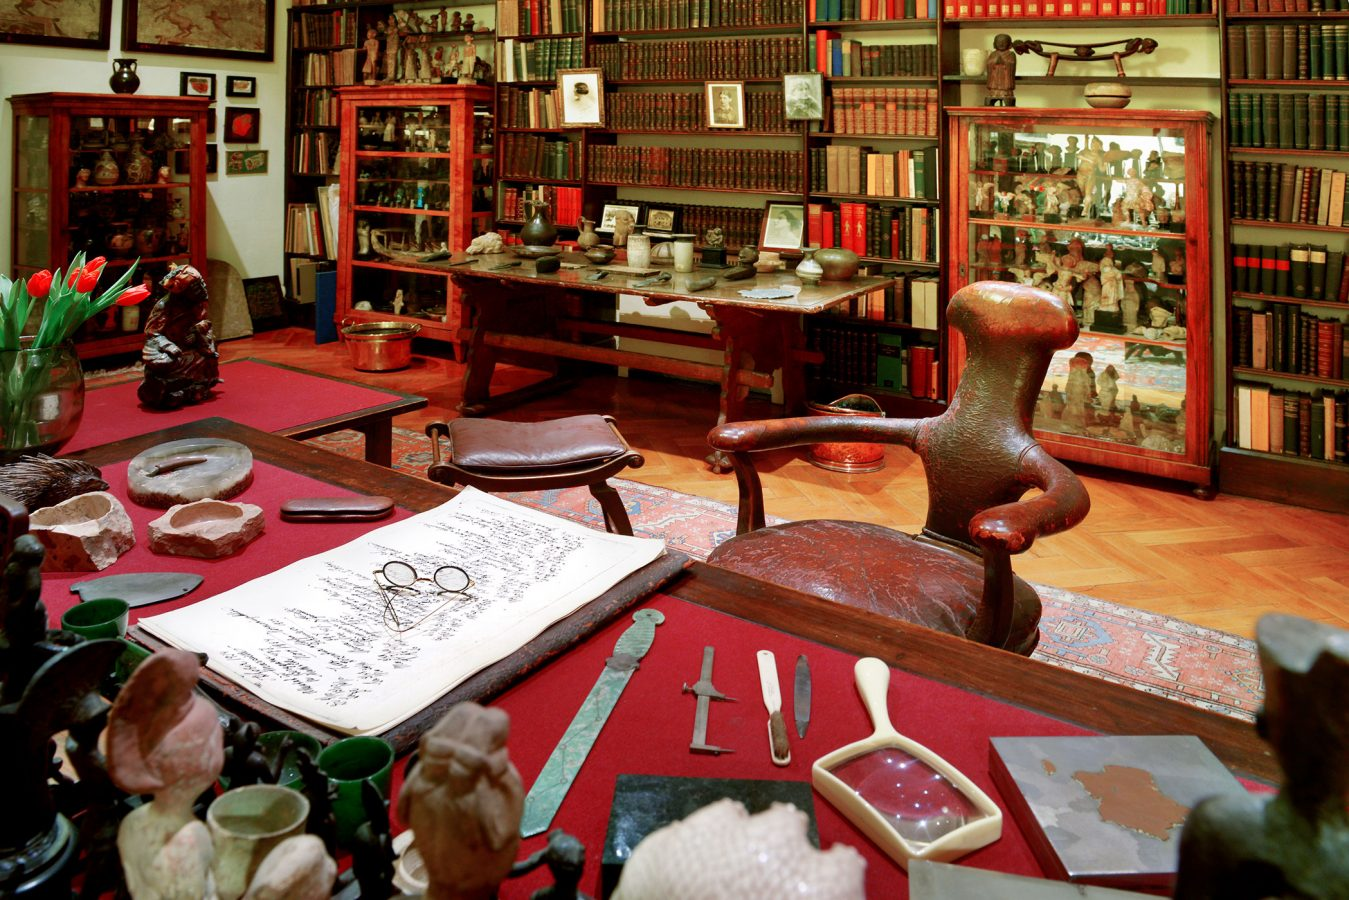 Sigmund Freud's House Desk in Library